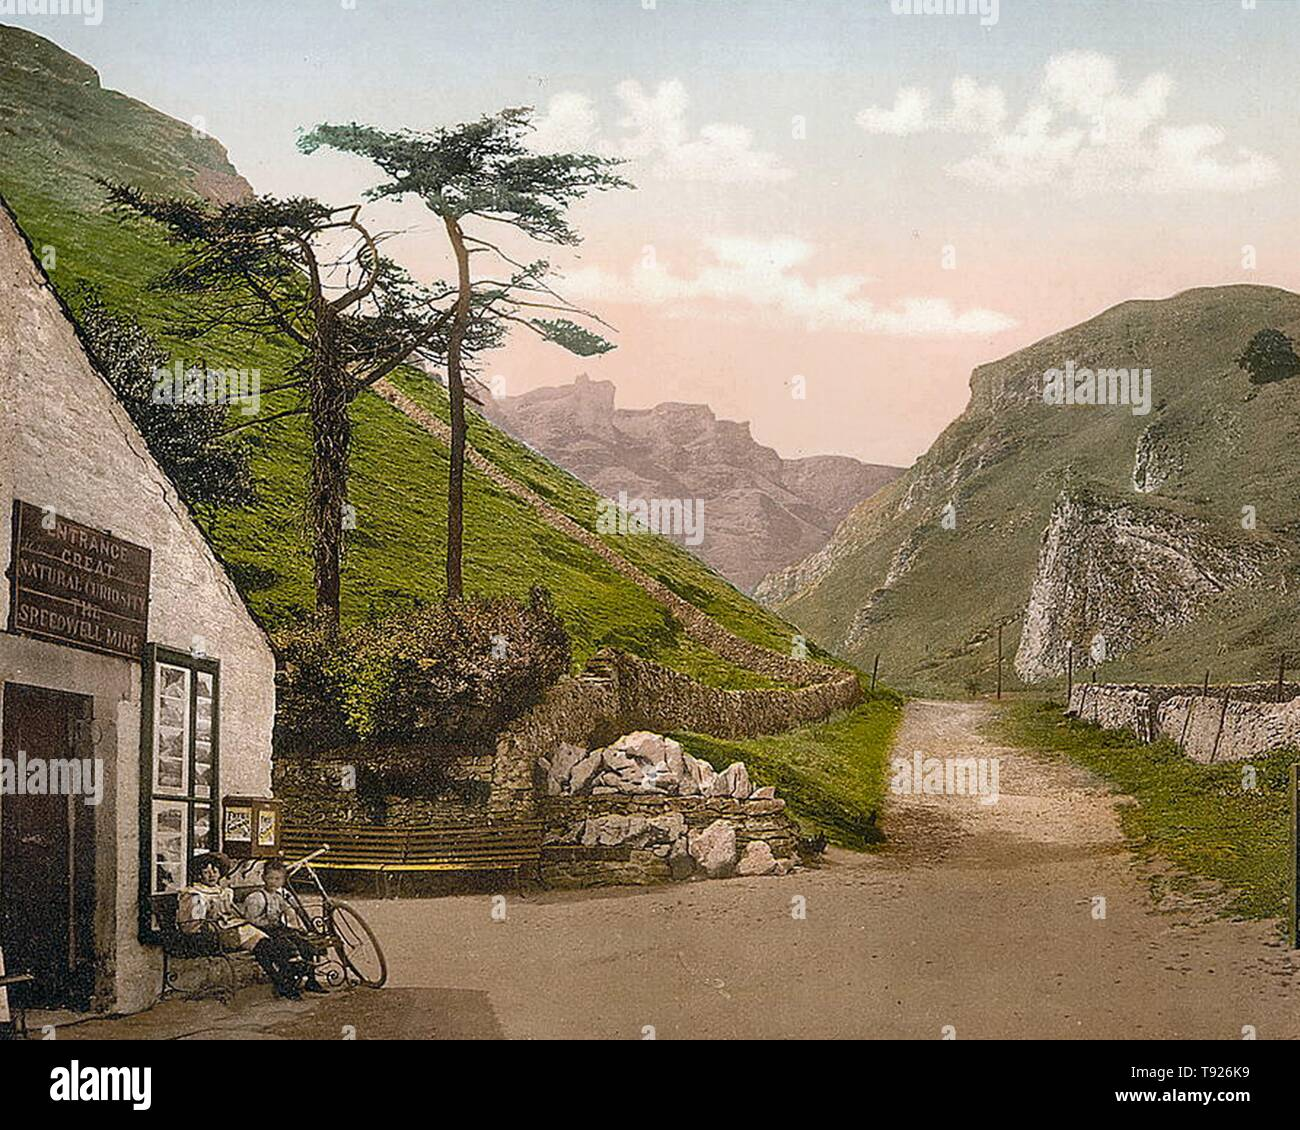 Winnats Pass, Castleton, Derbyshire, England. Stock Photo